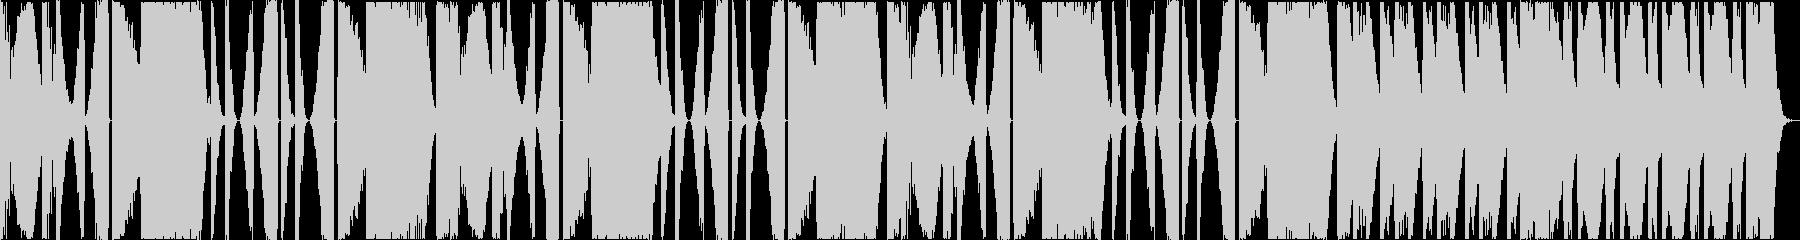 CM等制作用15秒ジャスト音源の未再生の波形